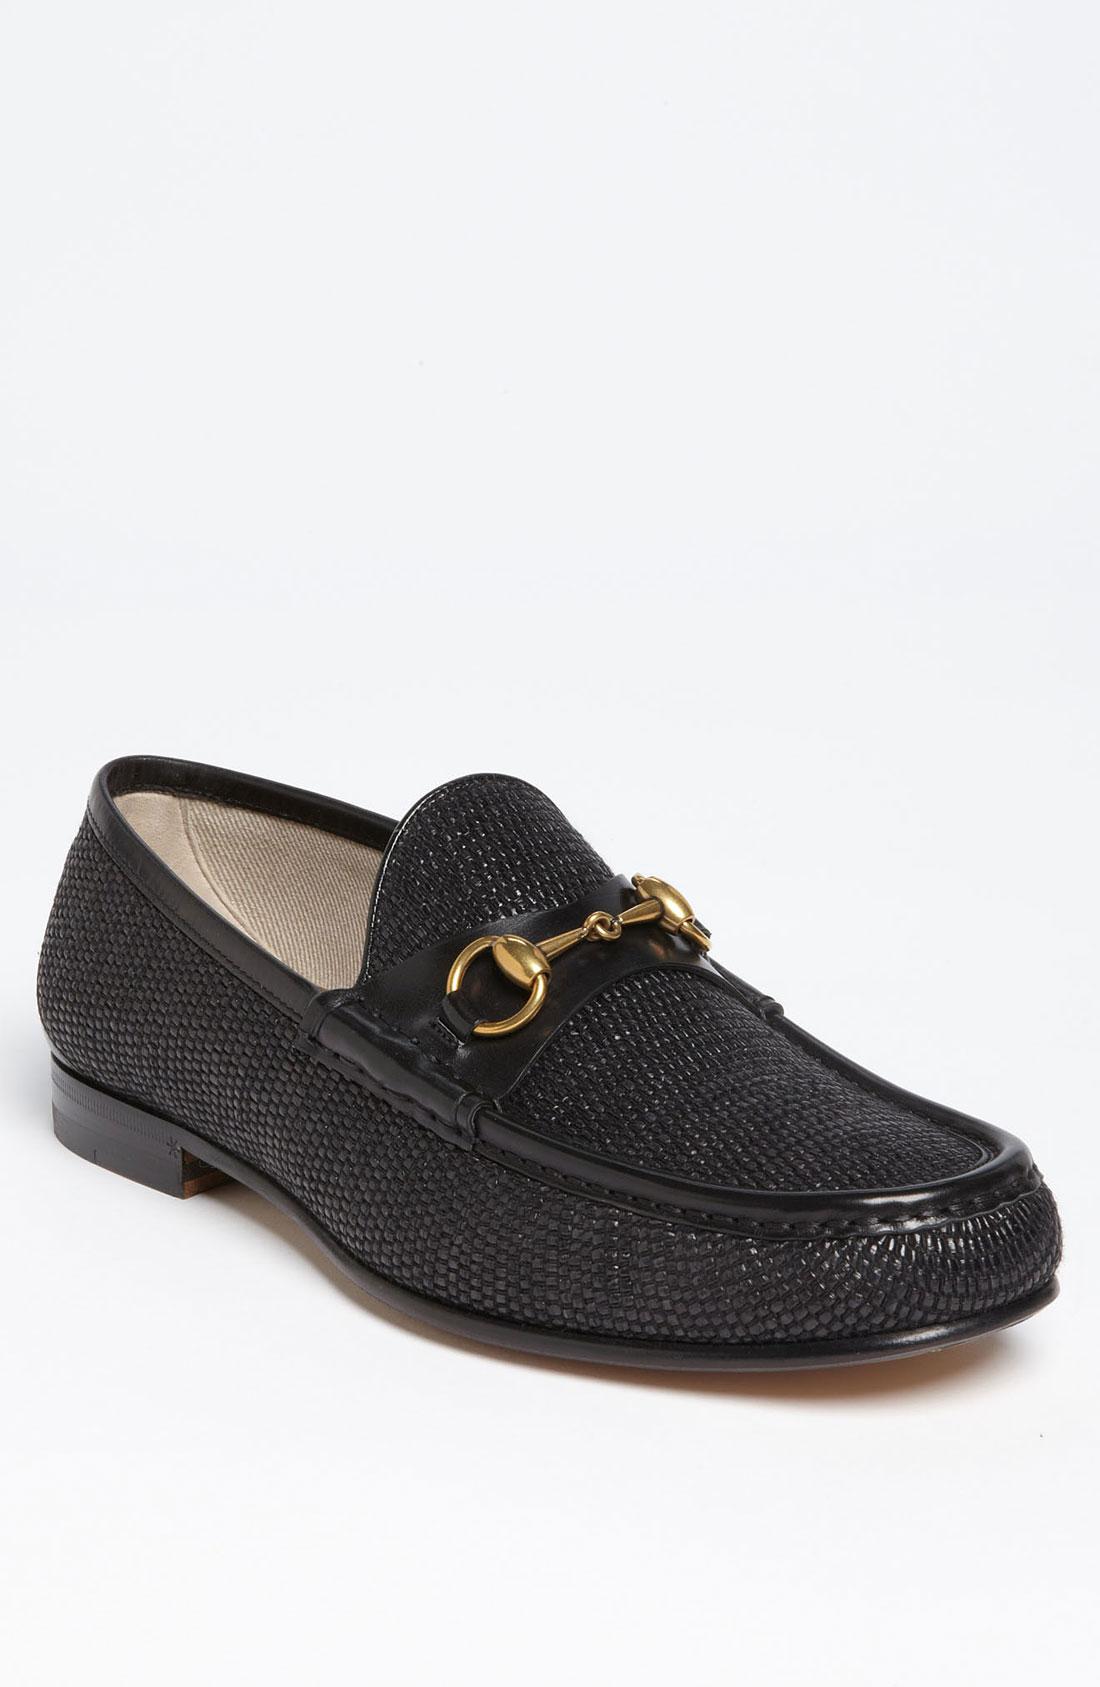 7ecda829df1 Gucci Roos Straw Bit Loafer in Black for Men